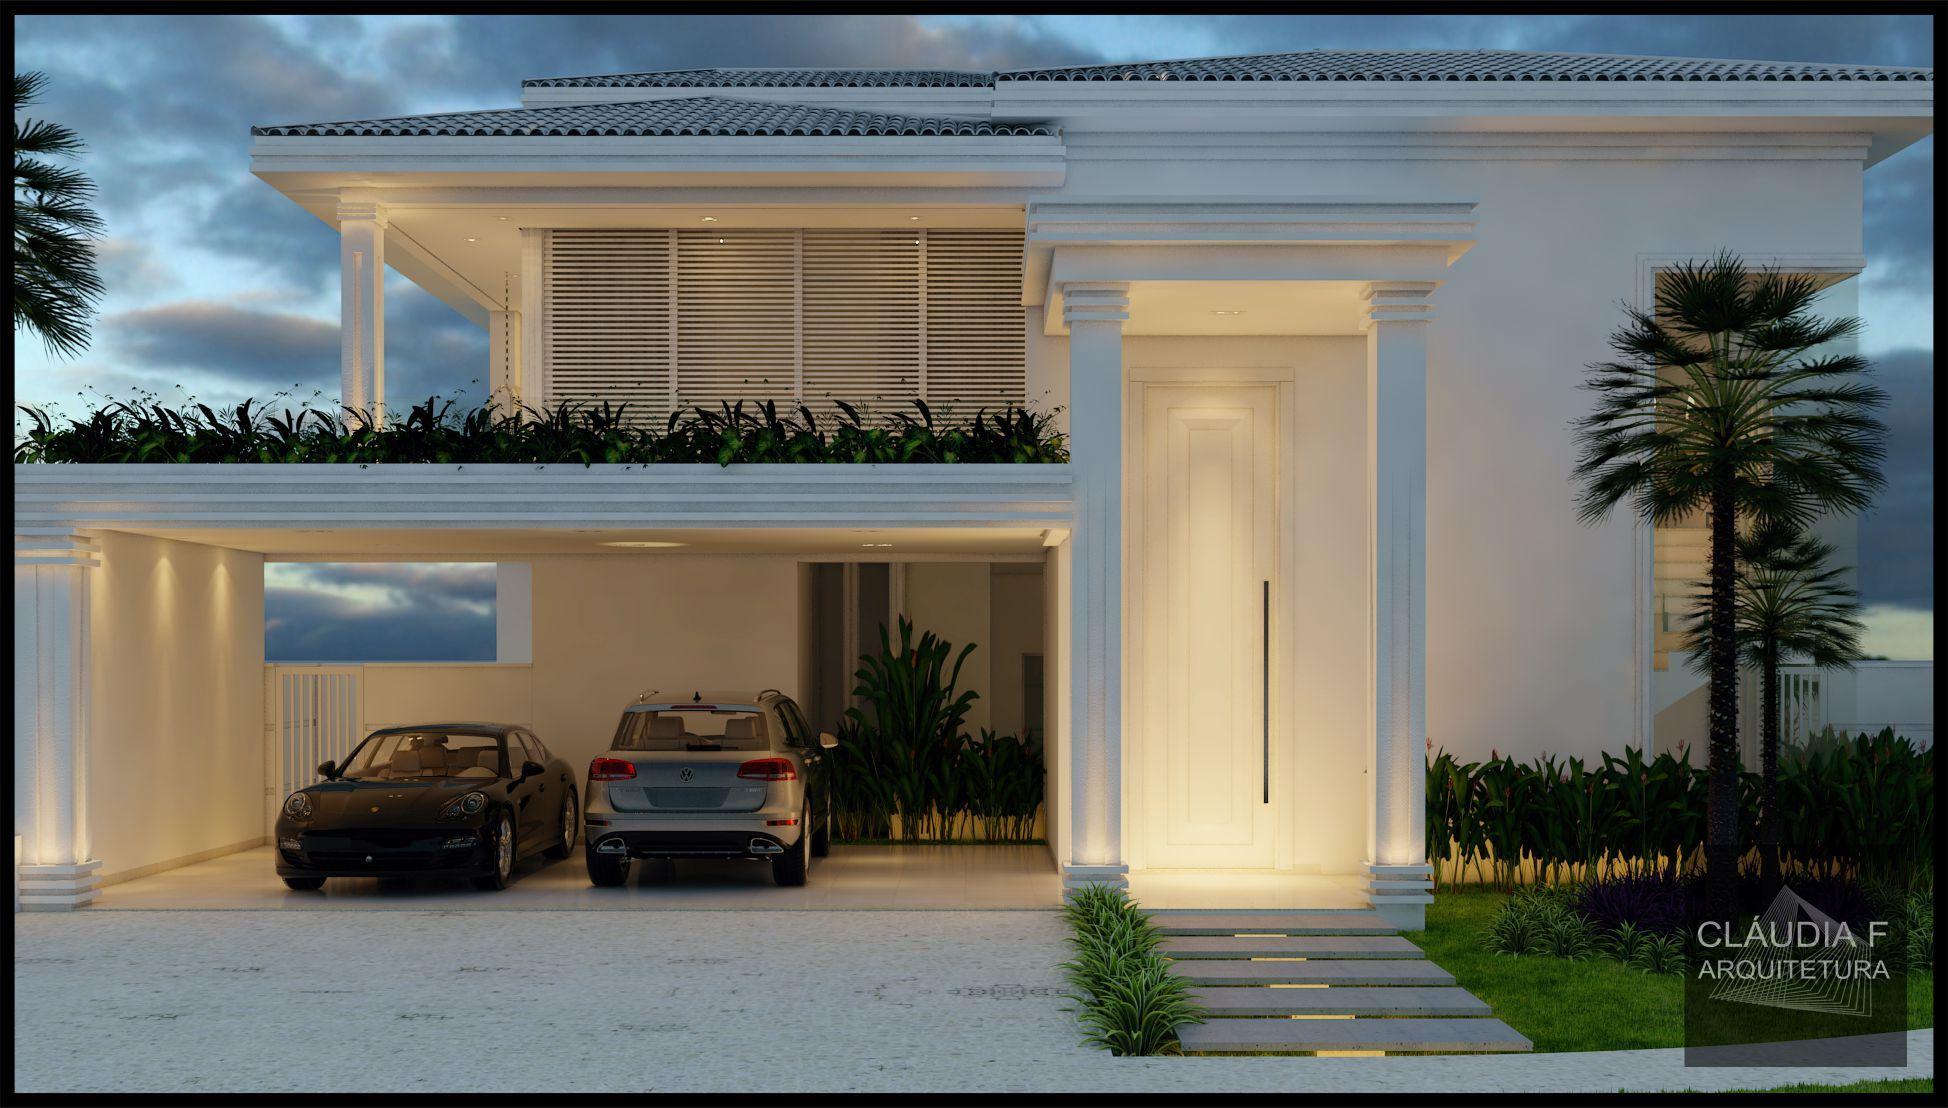 Fachada frontal resid ncia estilo cl ssica ficha for Fachada de la casa clasica